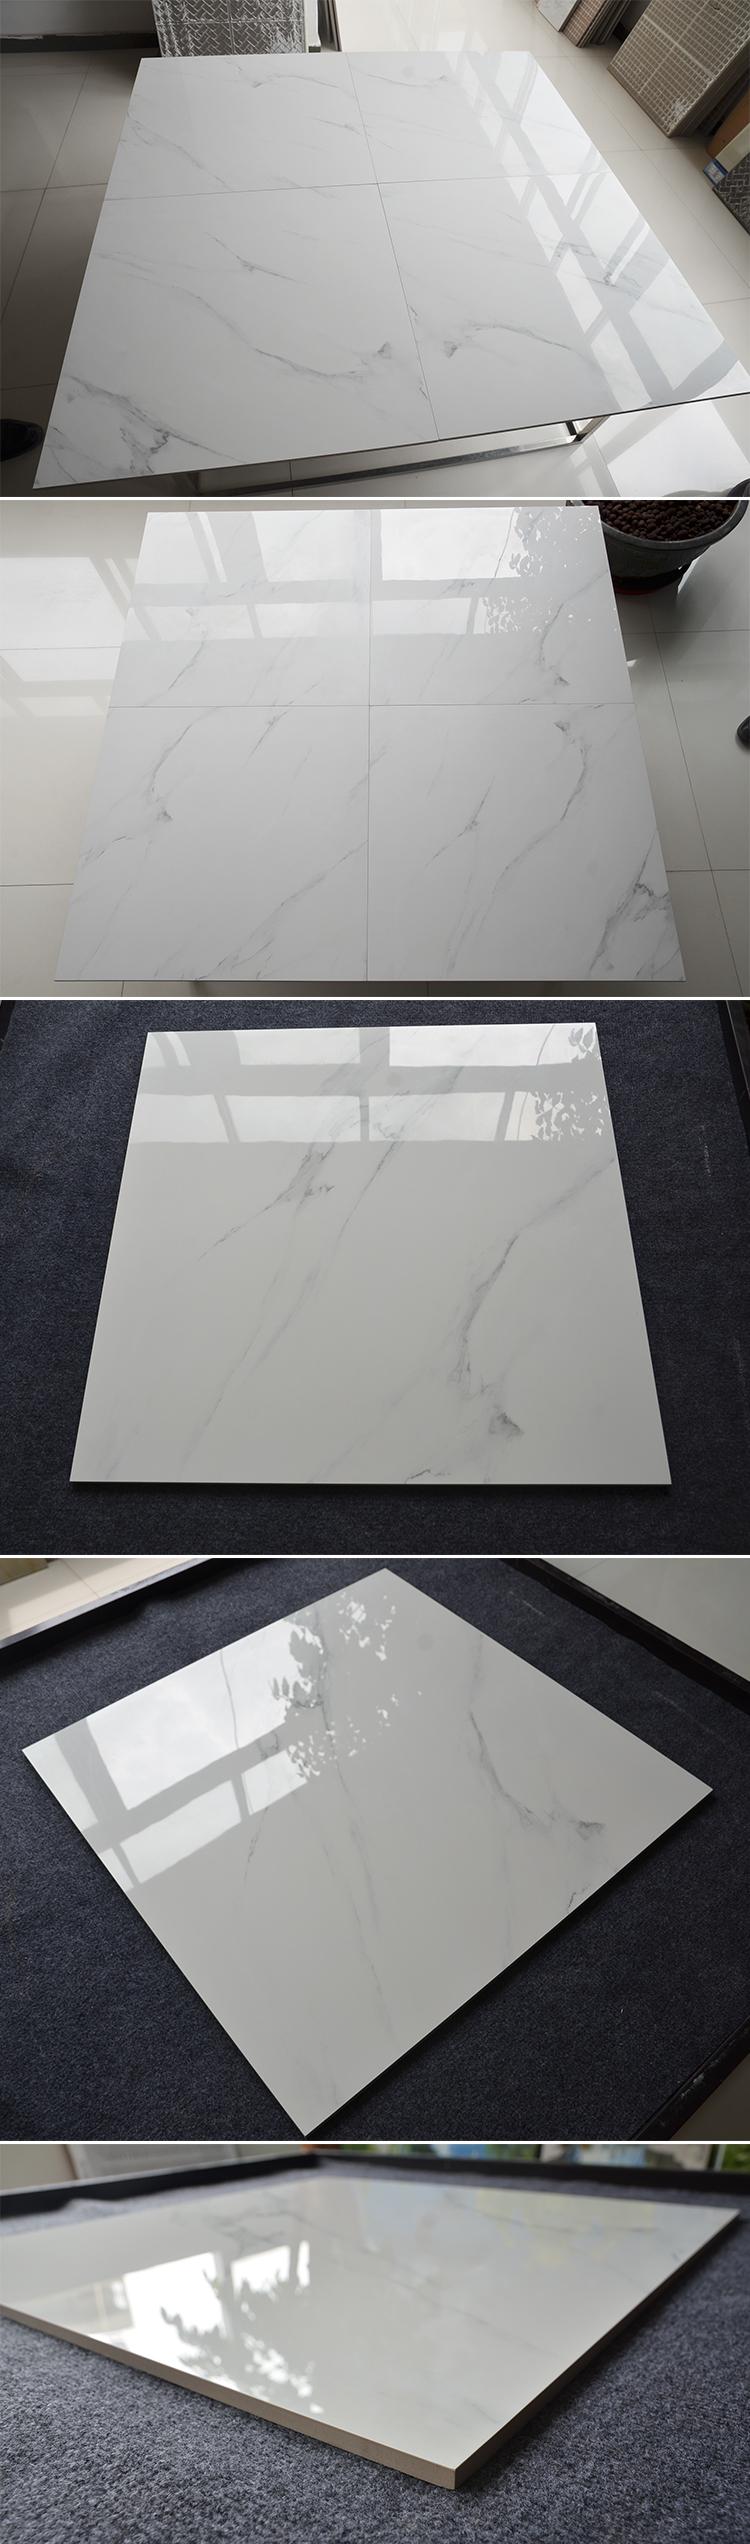 Hb6253 United States Ceramic Tile Companyceramic Foshanall Kind Of